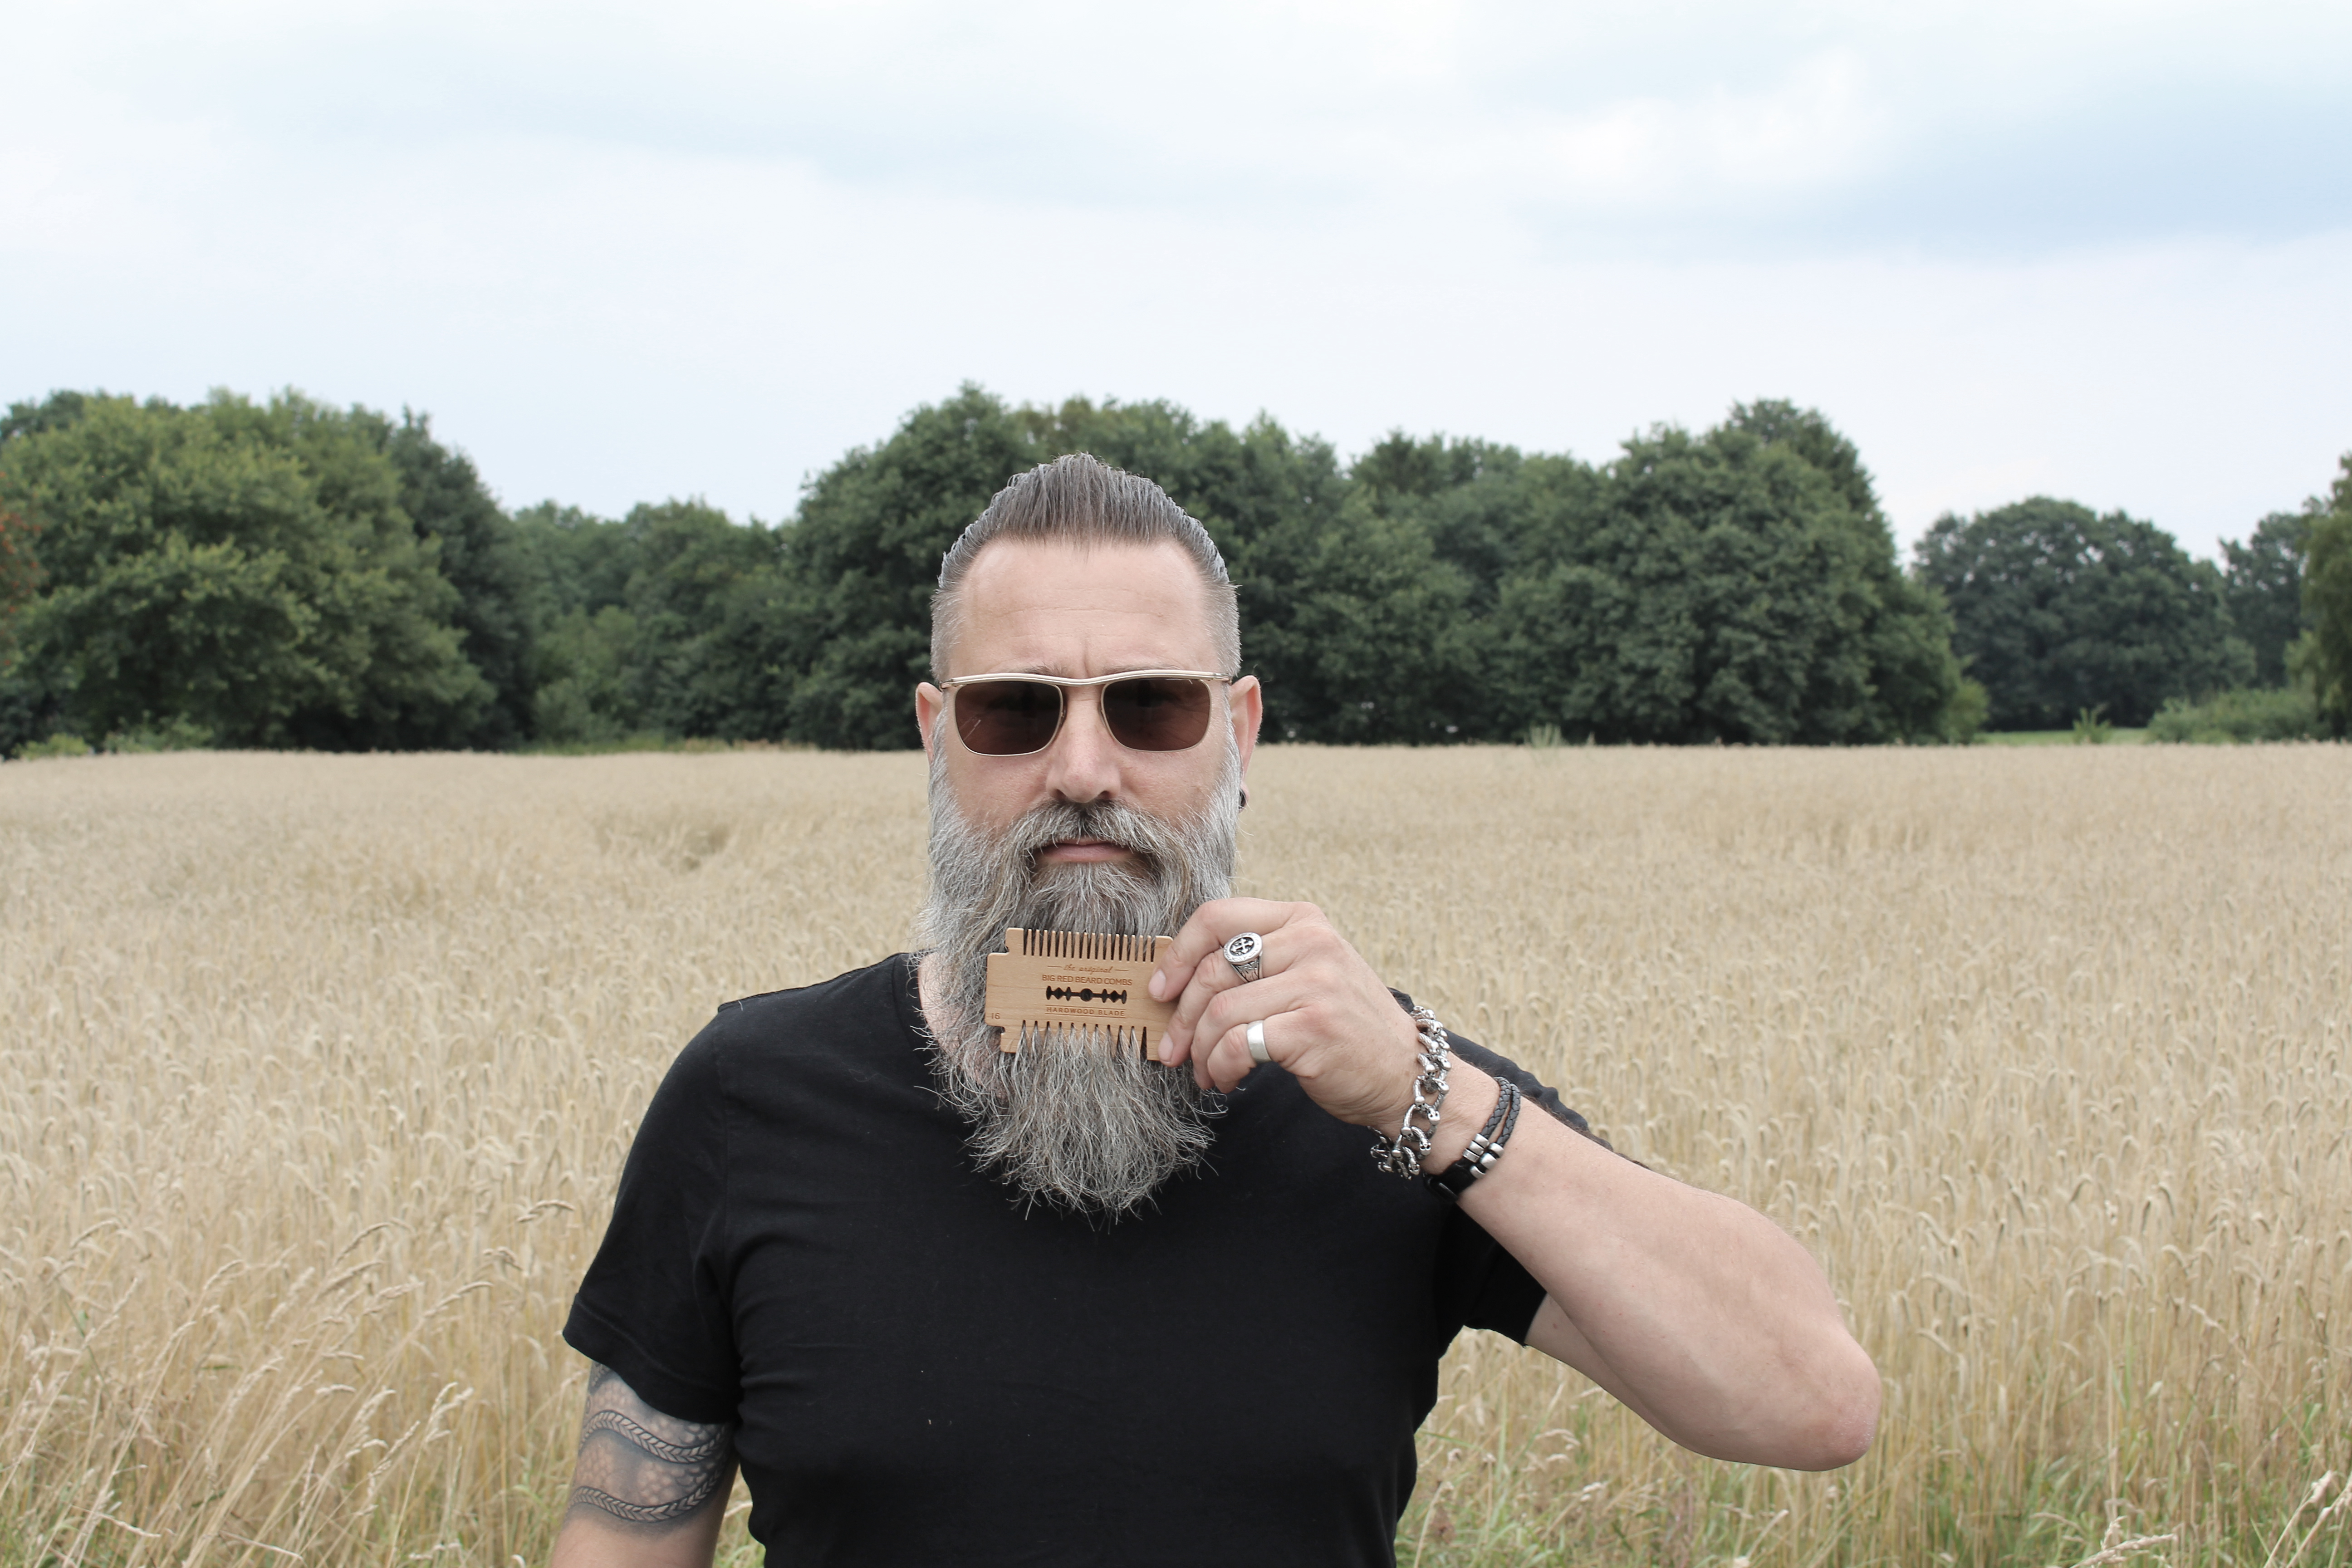 Beard & Shave Foto Bart Styling Gründer